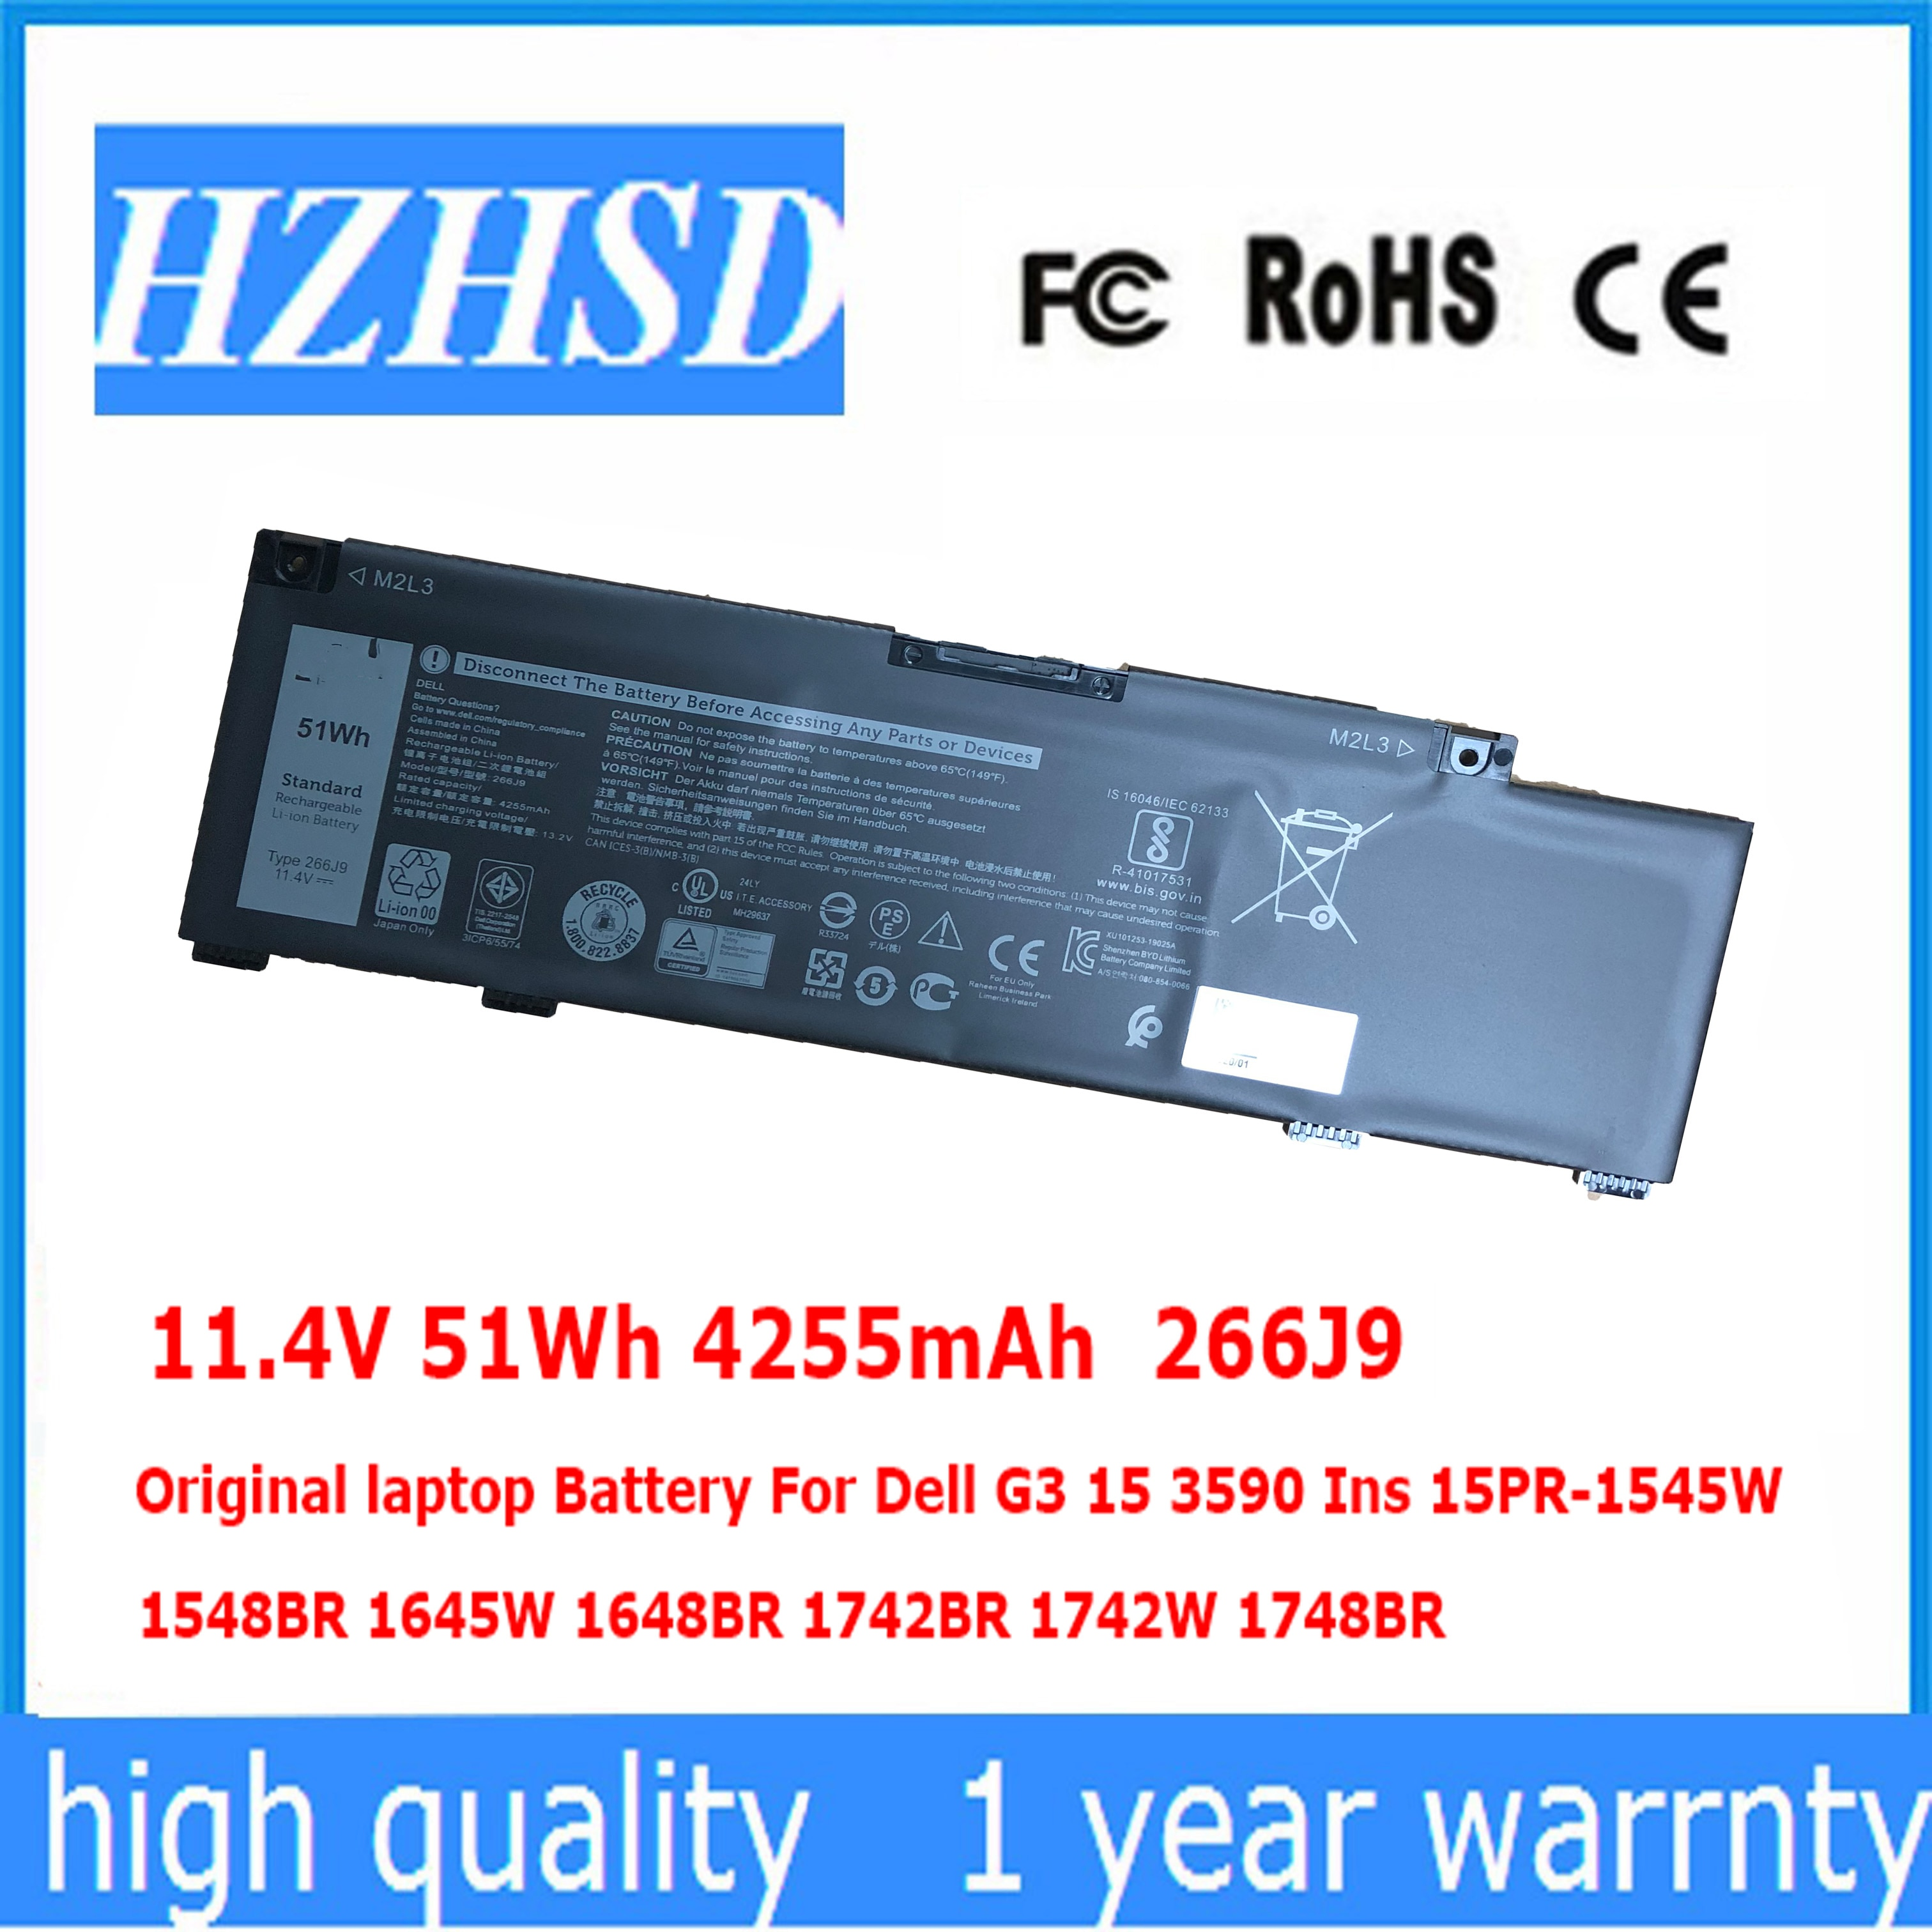 11.4V 51Wh 4255mAh Original 266J9 laptop Battery For Dell G3 15 3590 Ins 15PR-1545W 1548BR 1645W 164